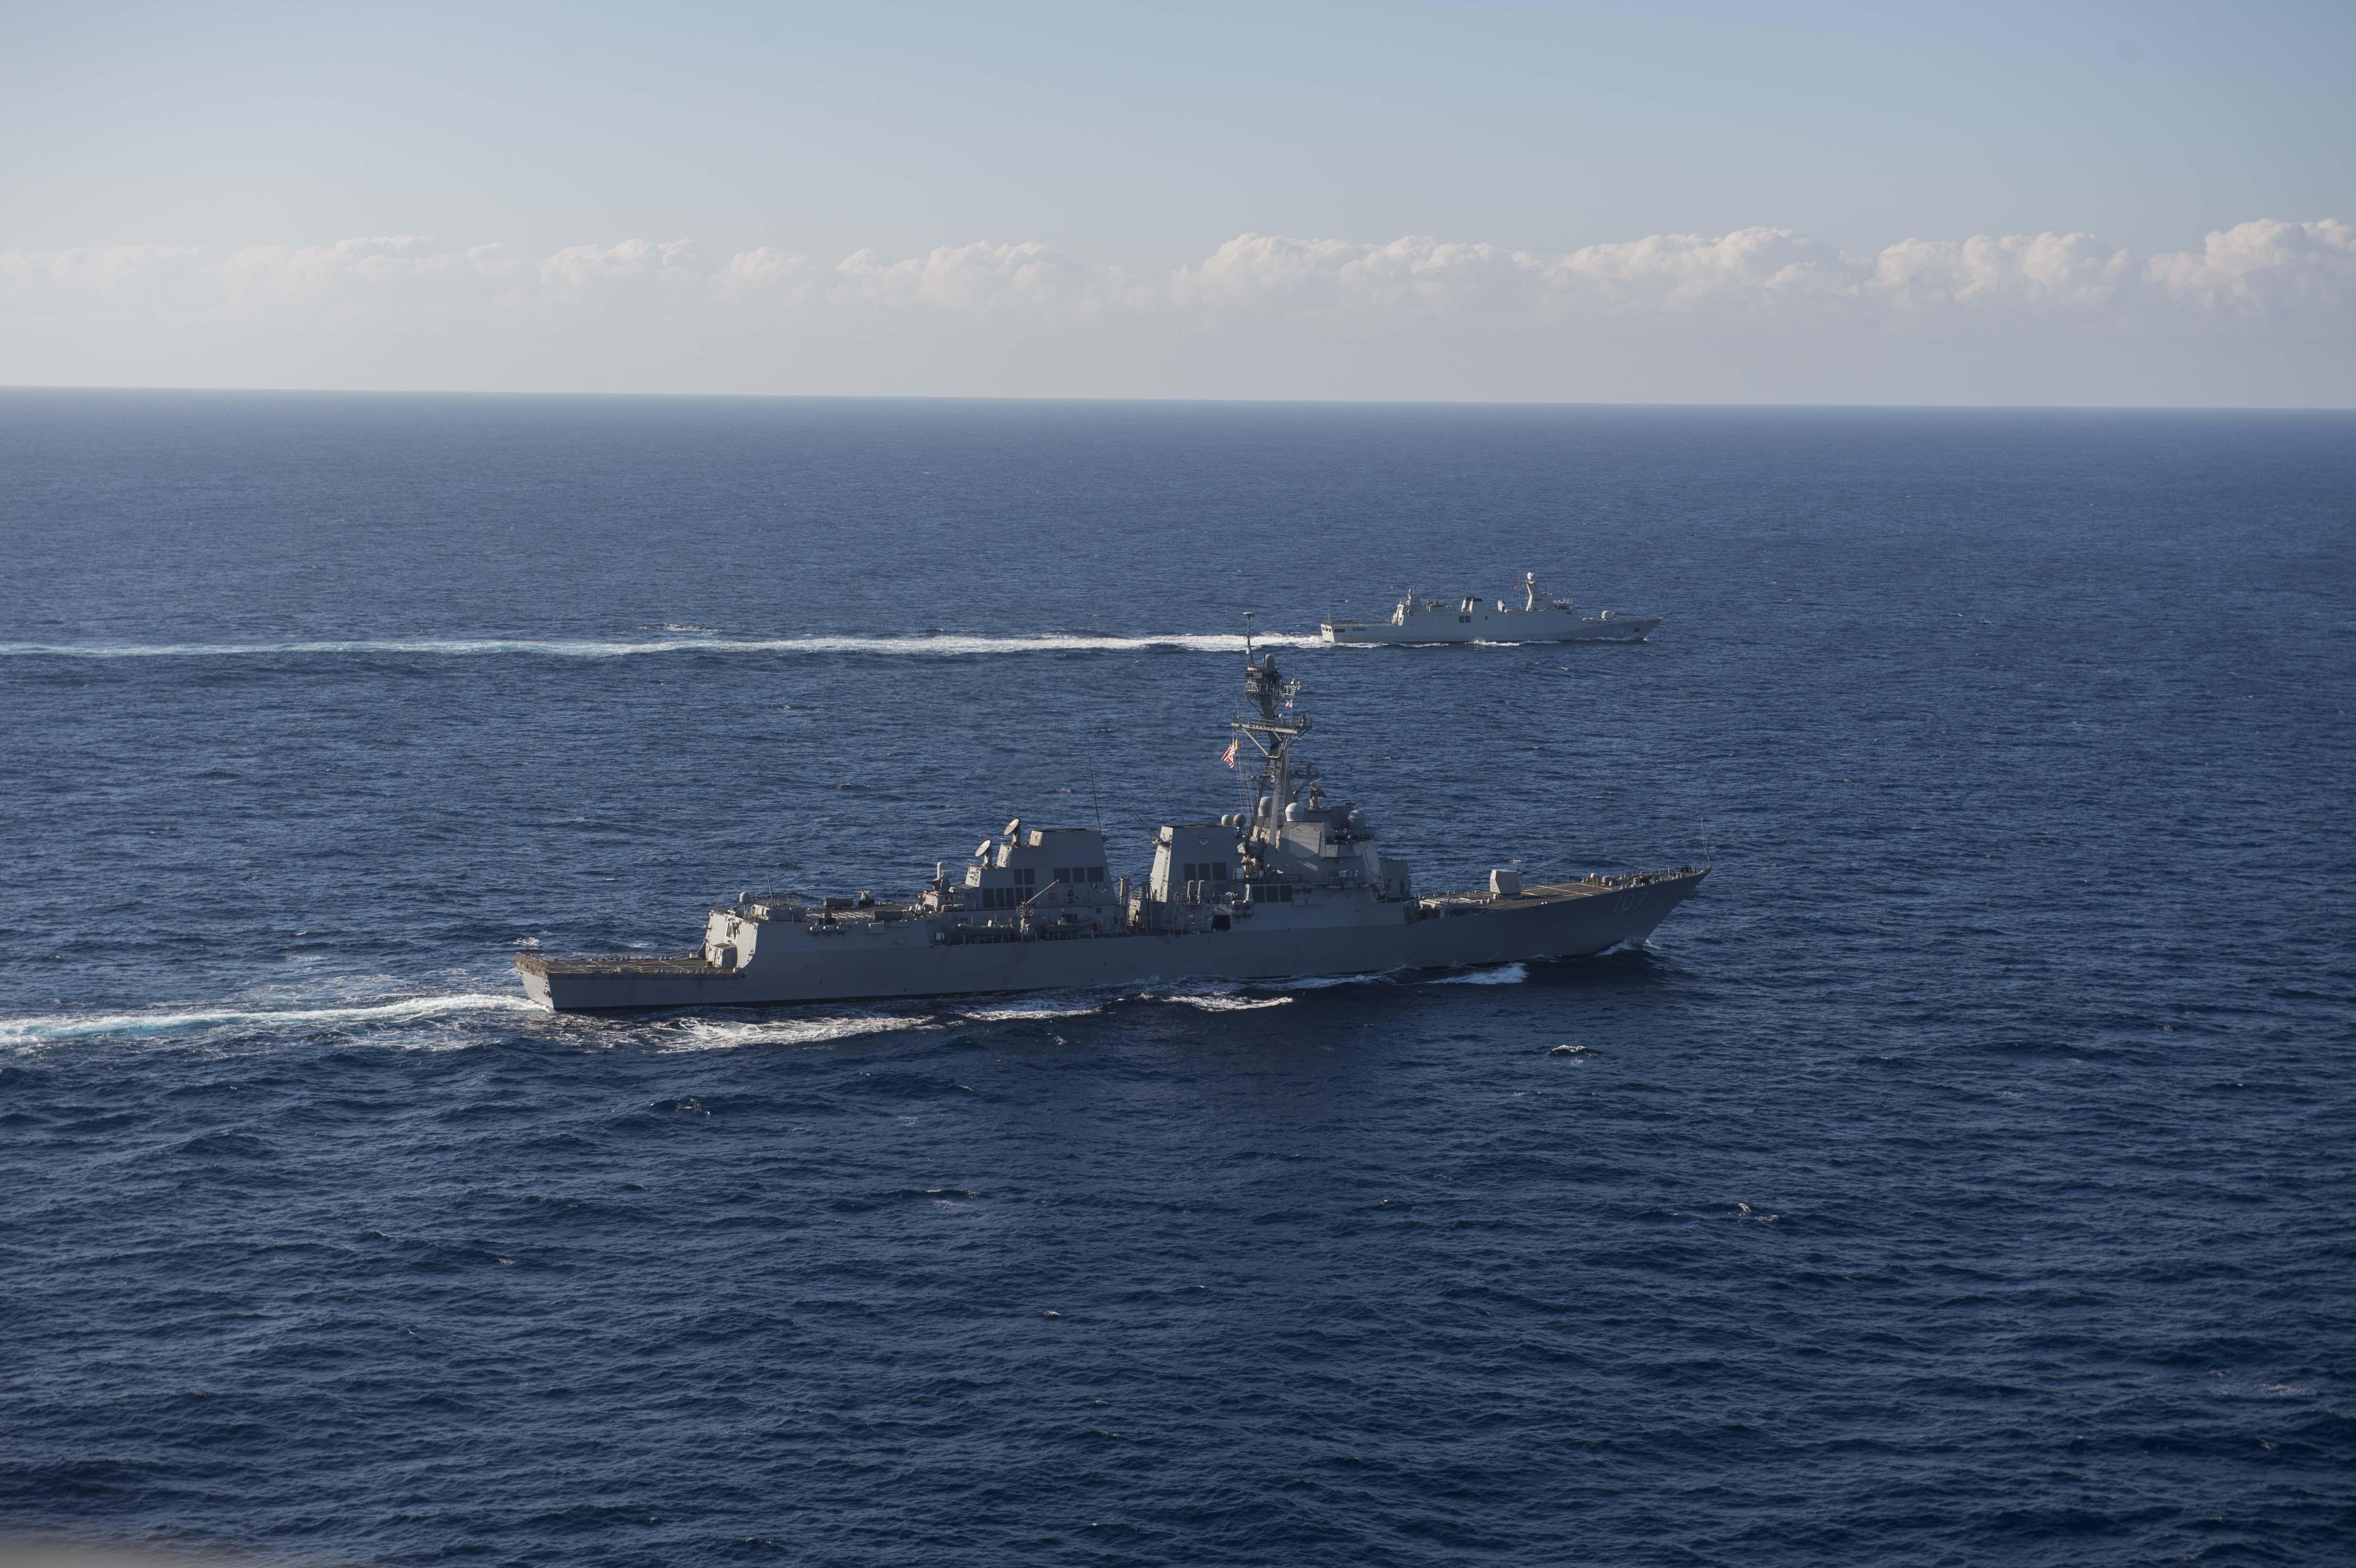 Passex 2015 : USS Gravely en exercice avec la frégate RMN Sultan Moulay Ismail  23510194595_fa1feb3293_o